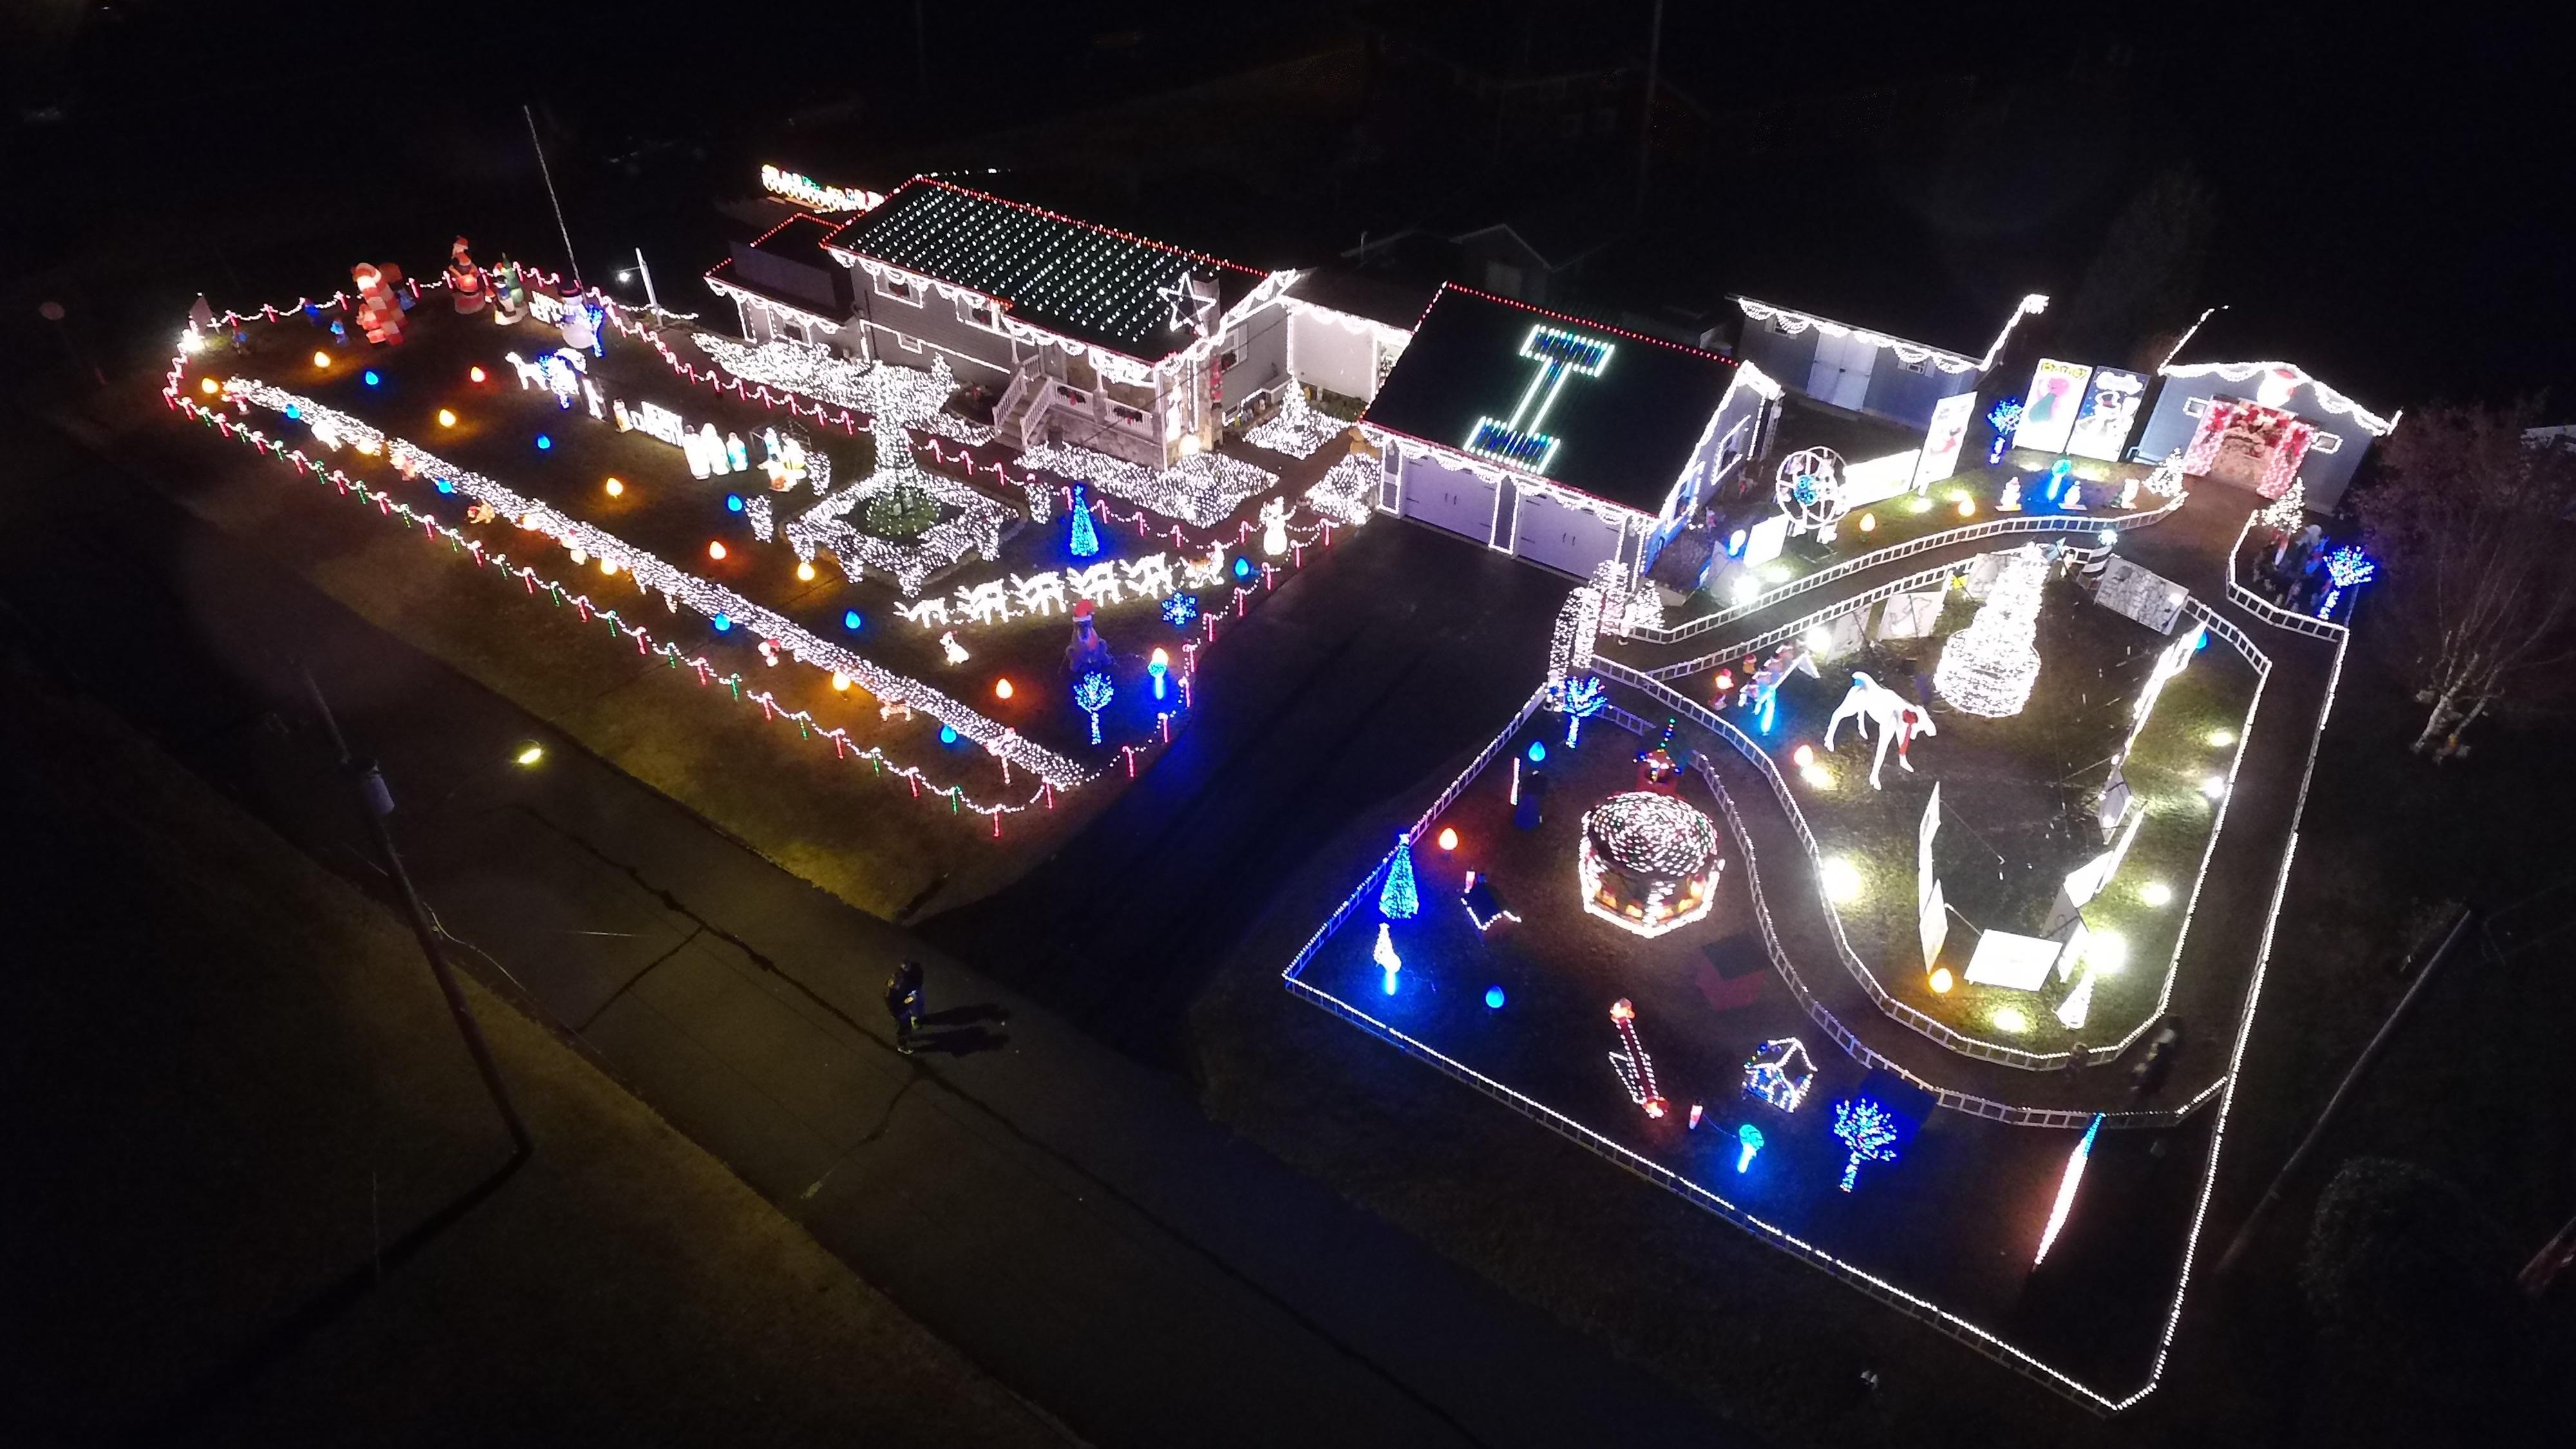 Fabrizio Holiday Light display raises $912 for Make-A-Wish